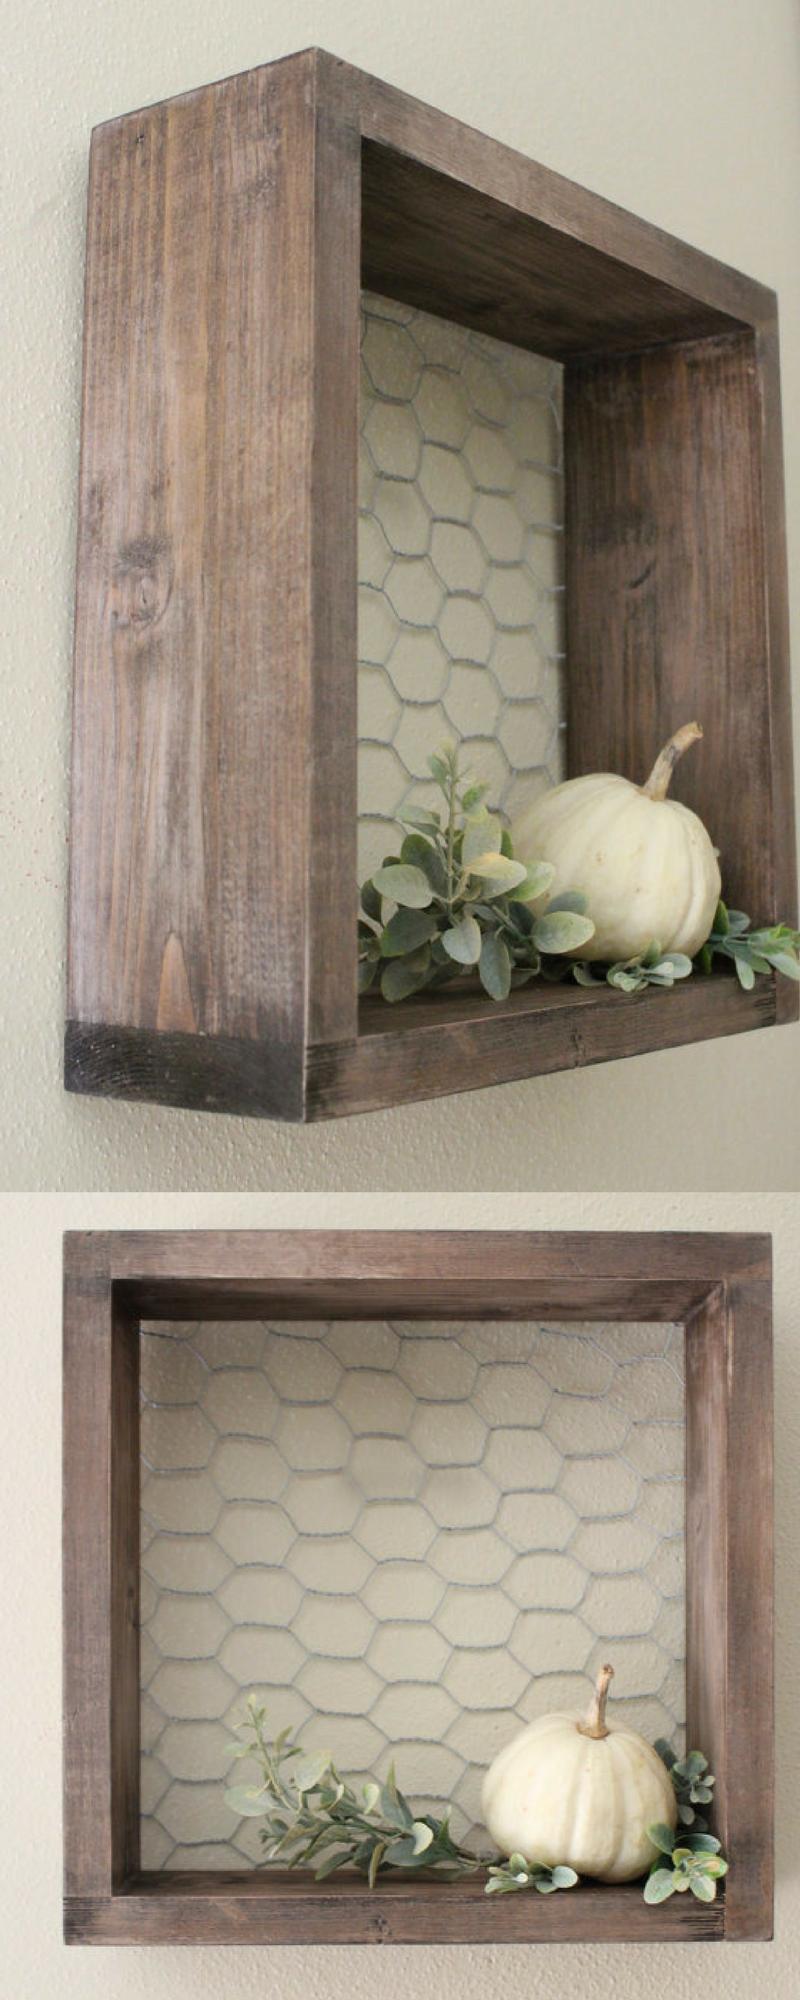 What a cool shelf chicken wire u wood shelf farmhouse decor wall